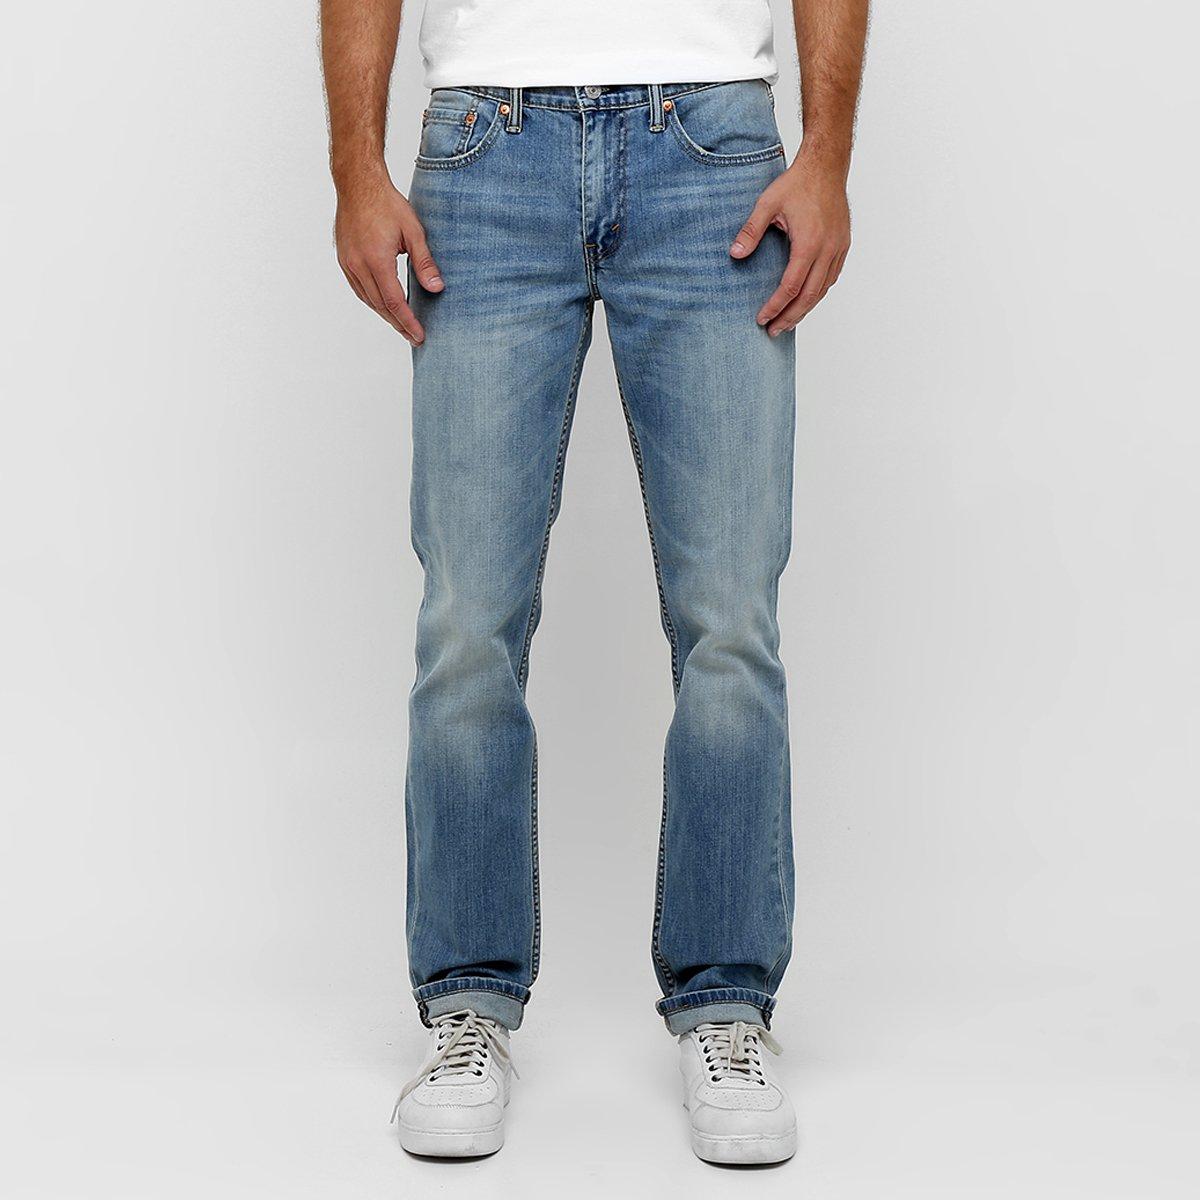 Calça Jeans Levi s 511 Slim Fit - Compre Agora  d2f7ded31ab